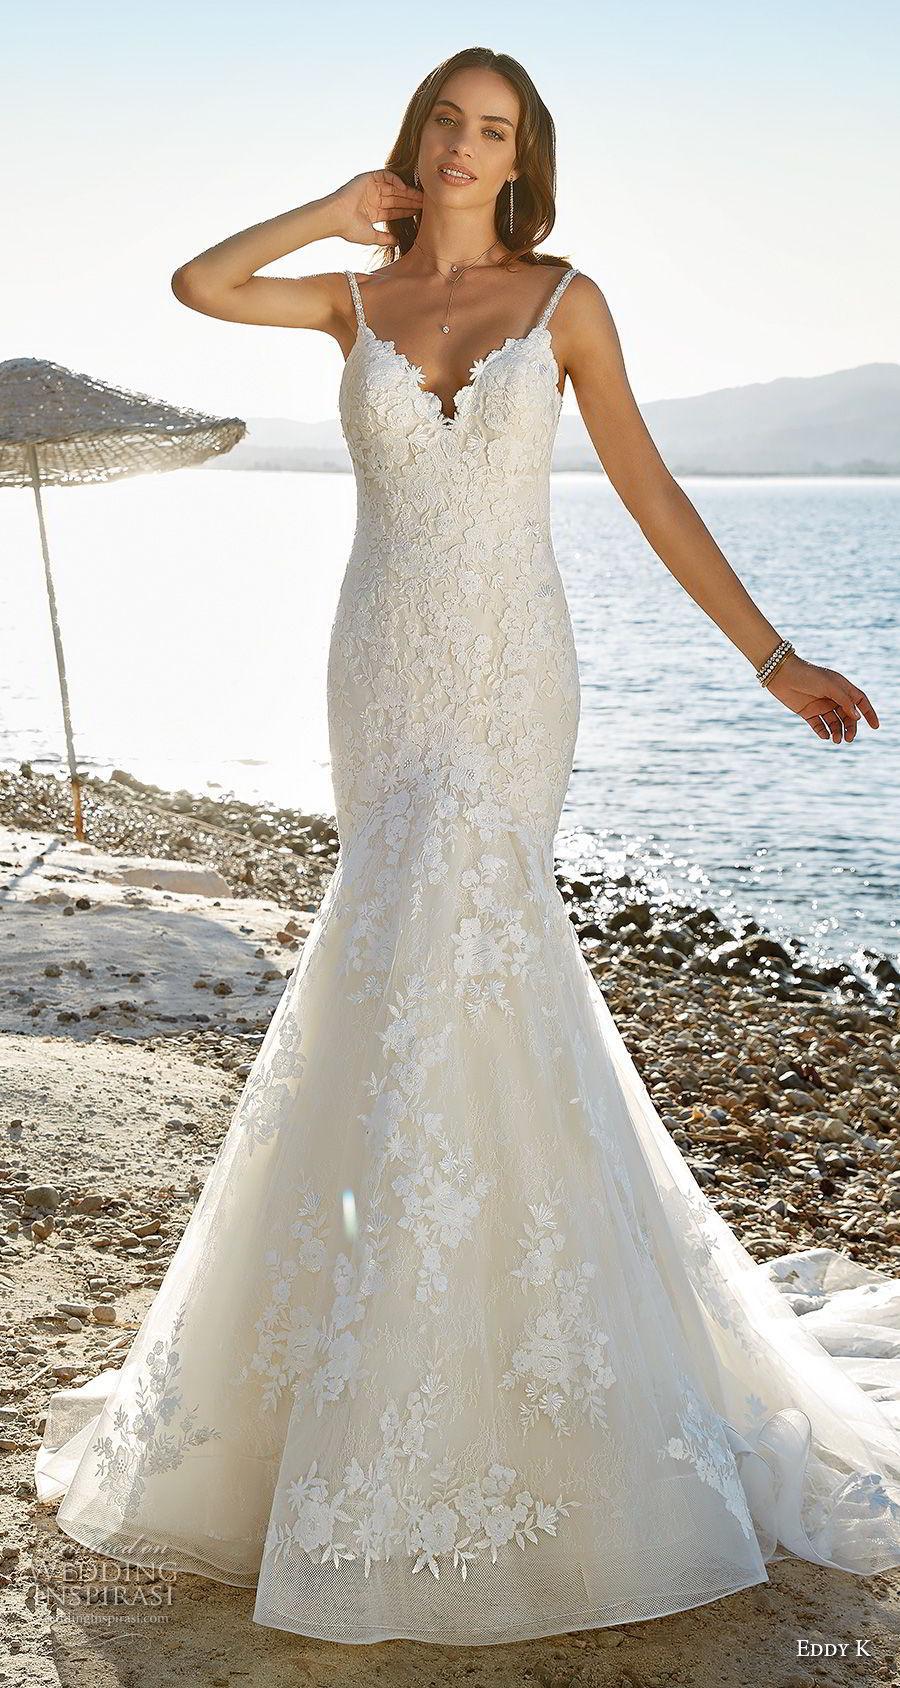 Full Embellishment Mermaid Wedding Dresses 2018 Eddy K Bridal ...